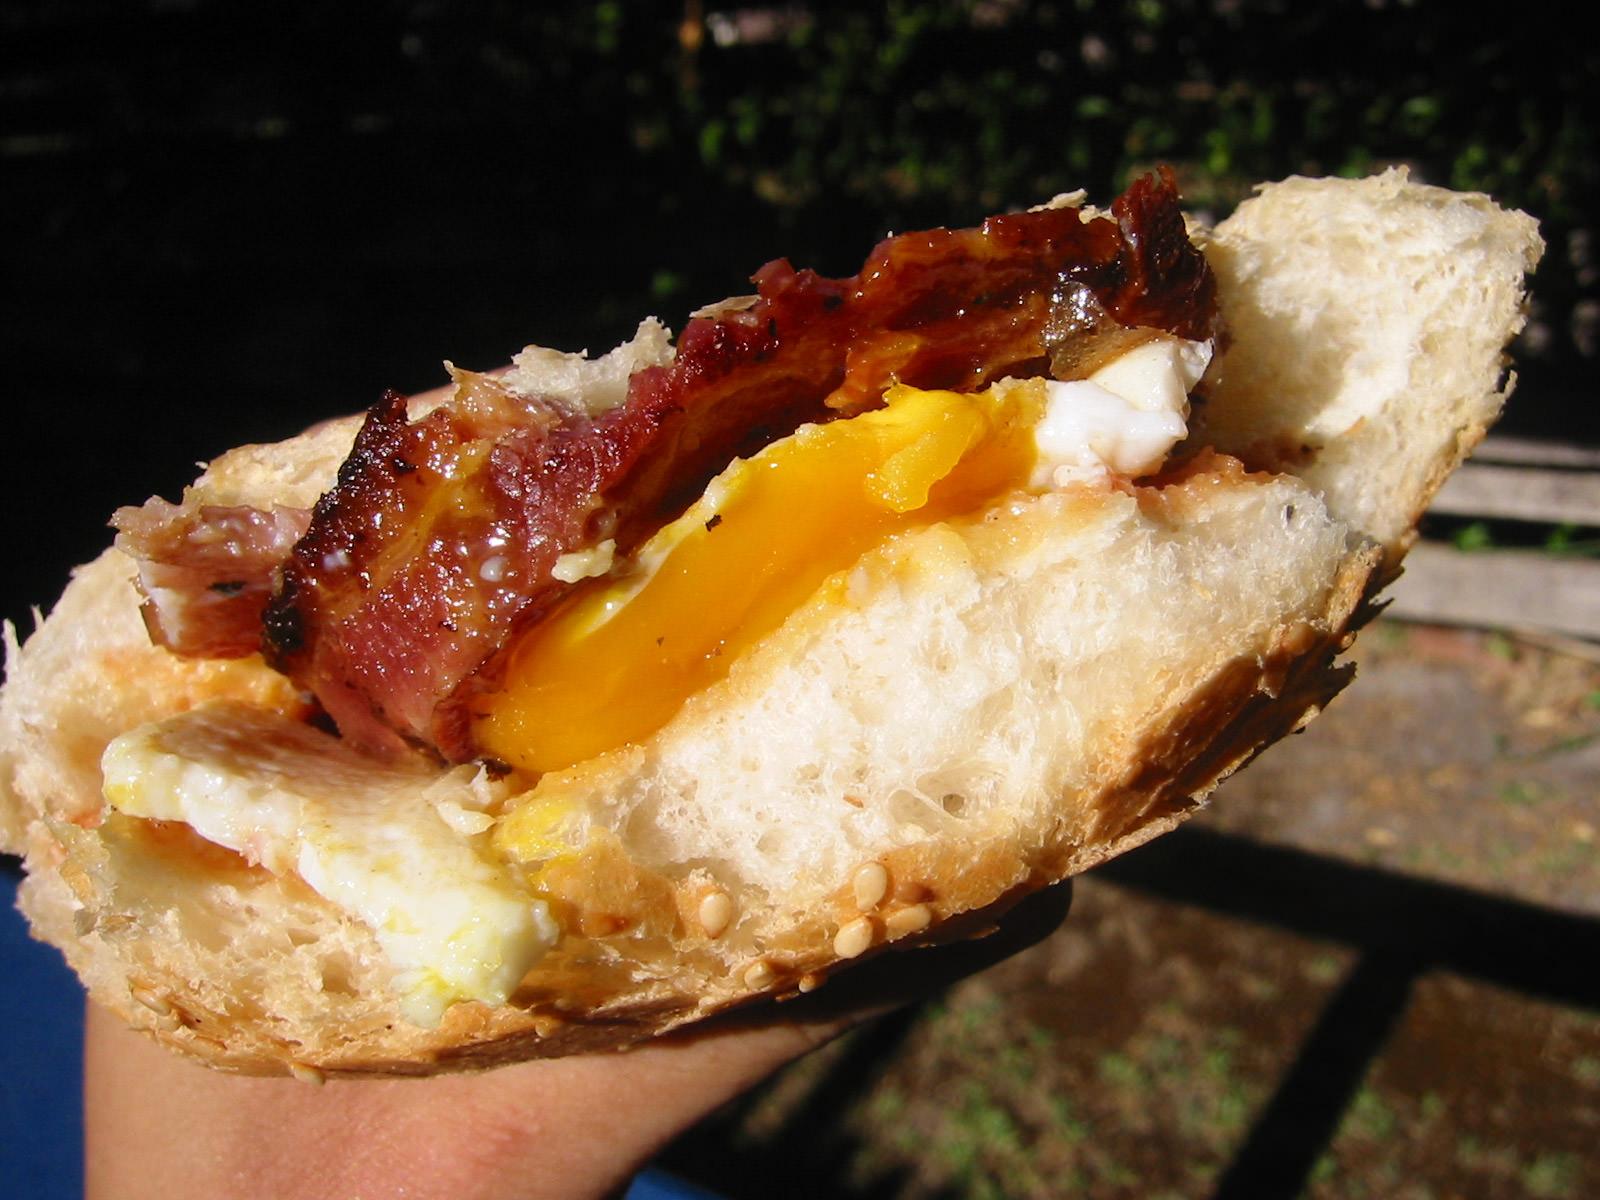 I love runny yolks!